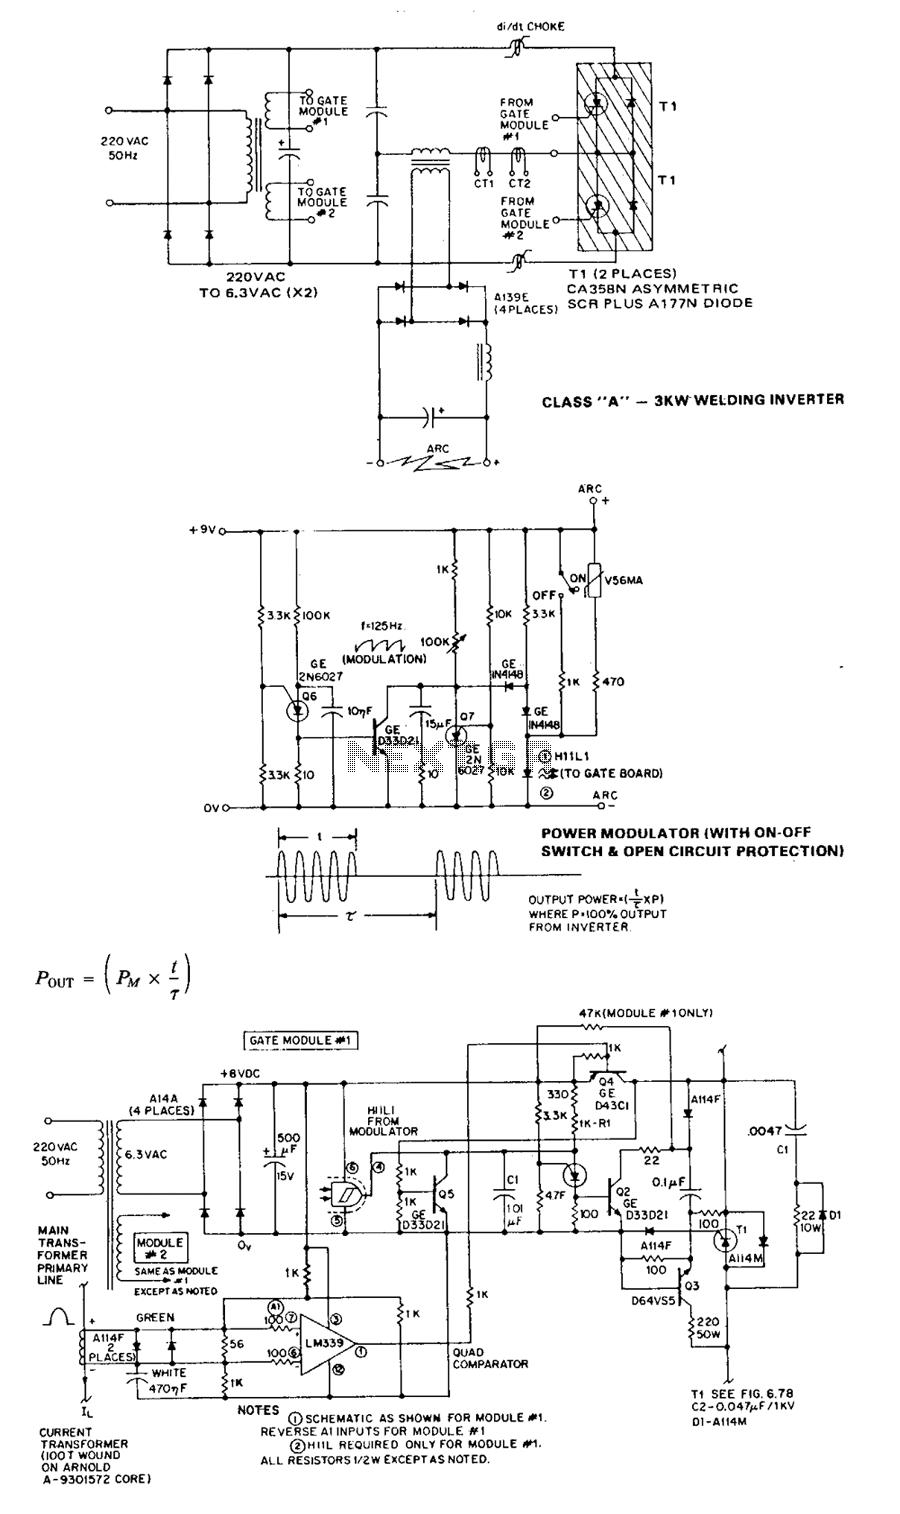 electric resistance welding diagram